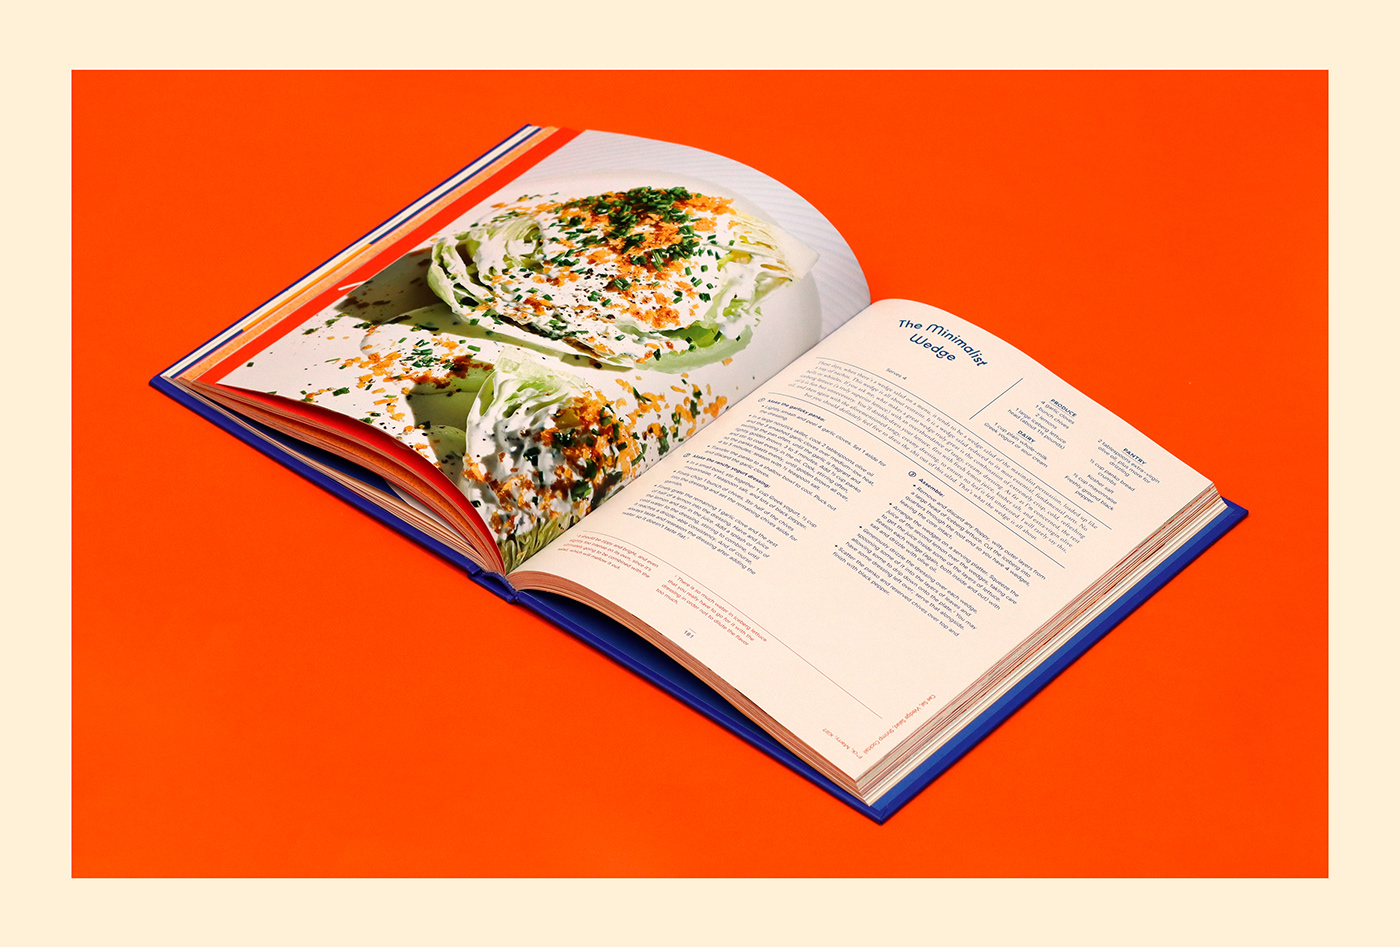 Clarkson Potter cook cooking book font kobe molly baz penguin Violaine et Jeremy vj type voyage